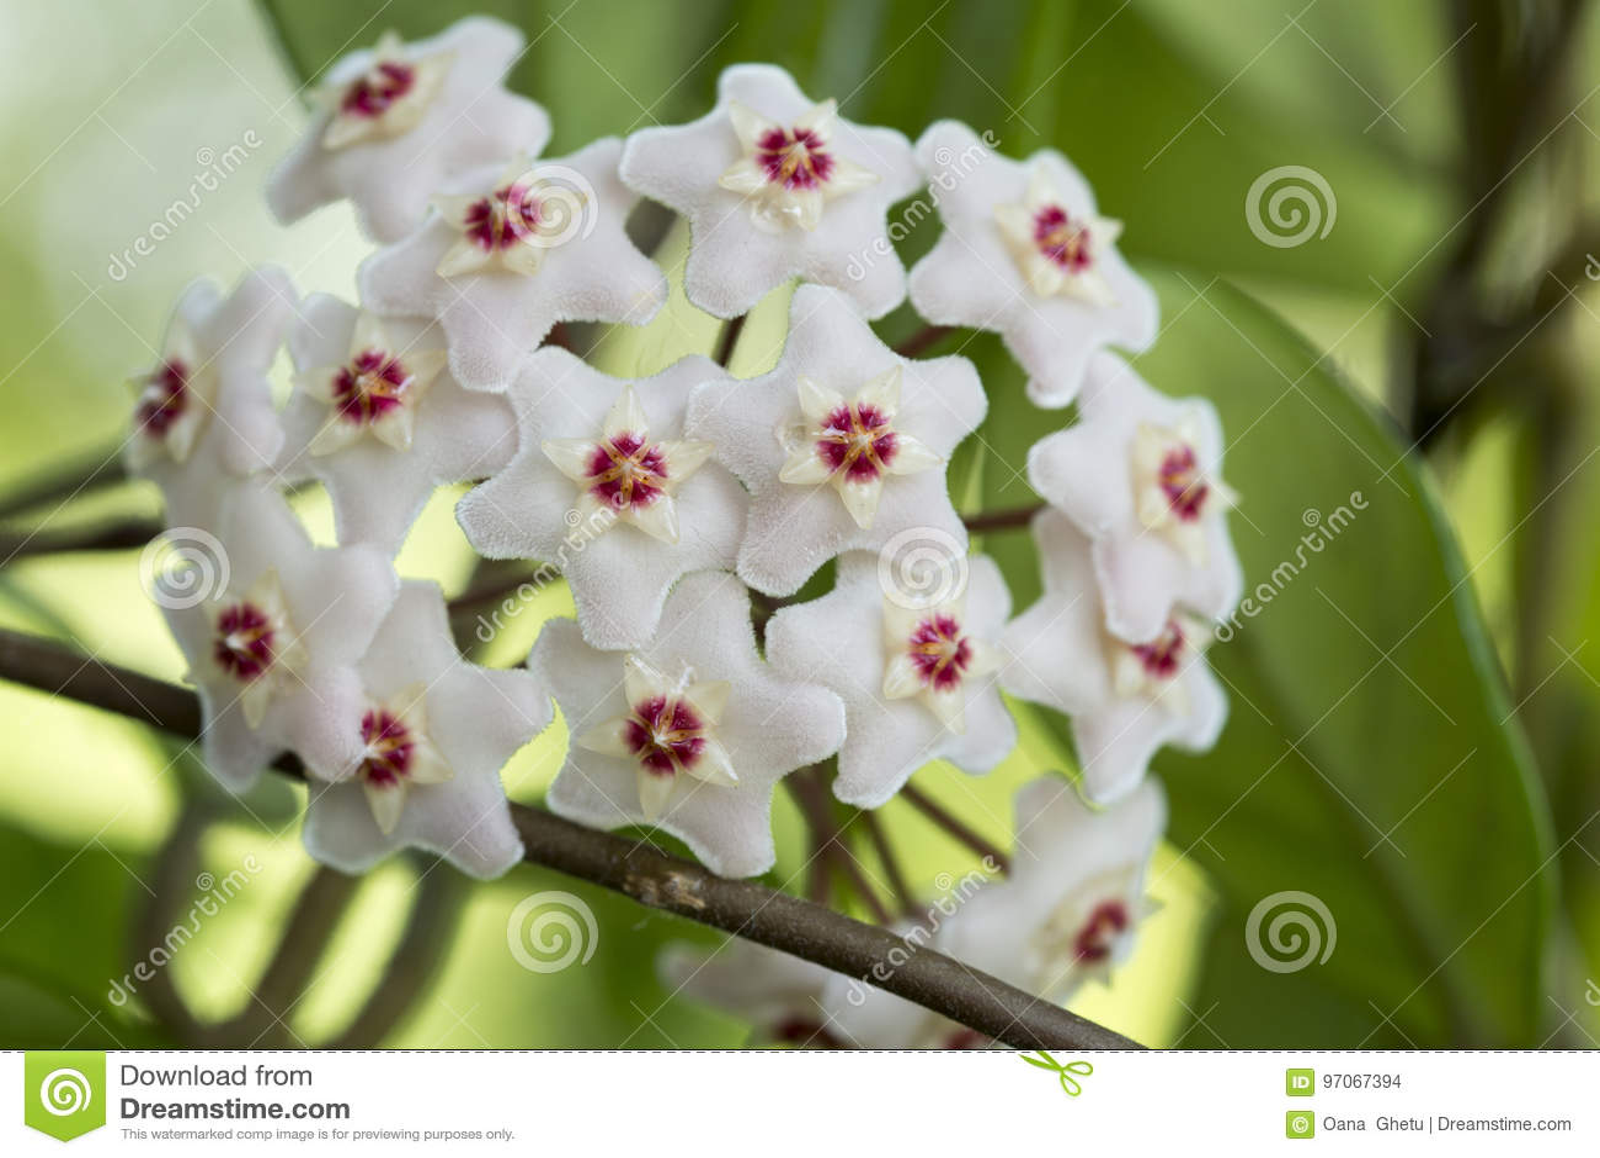 Porcelainflower ou usine de cire